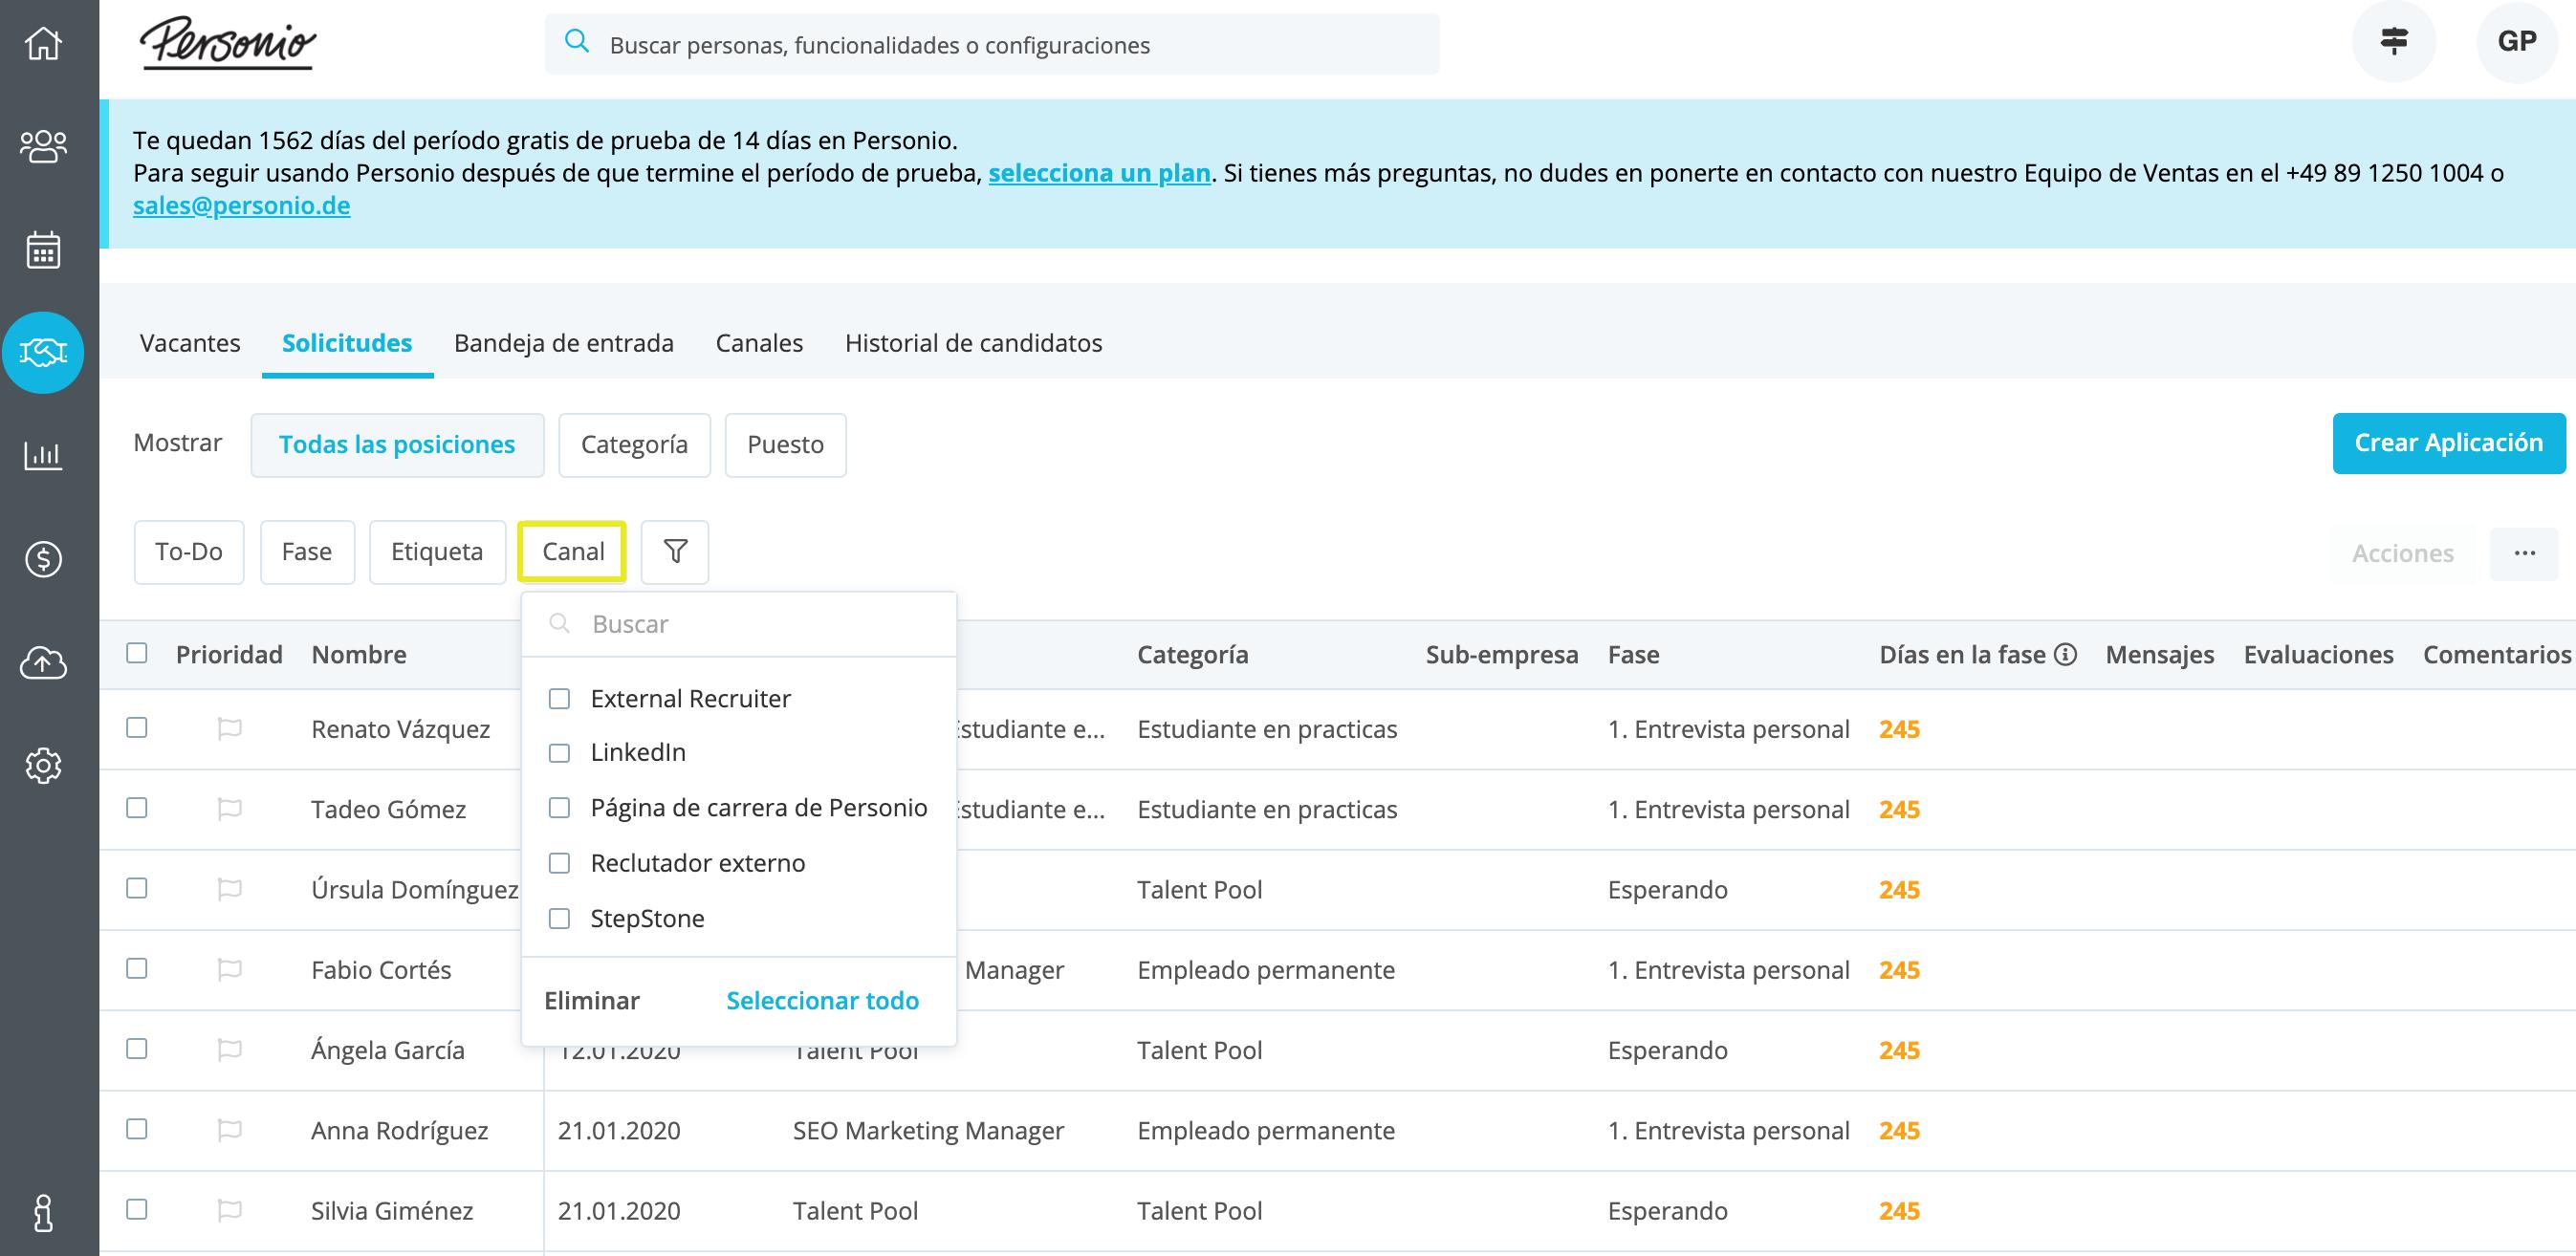 application-list-filter-channel_es.png